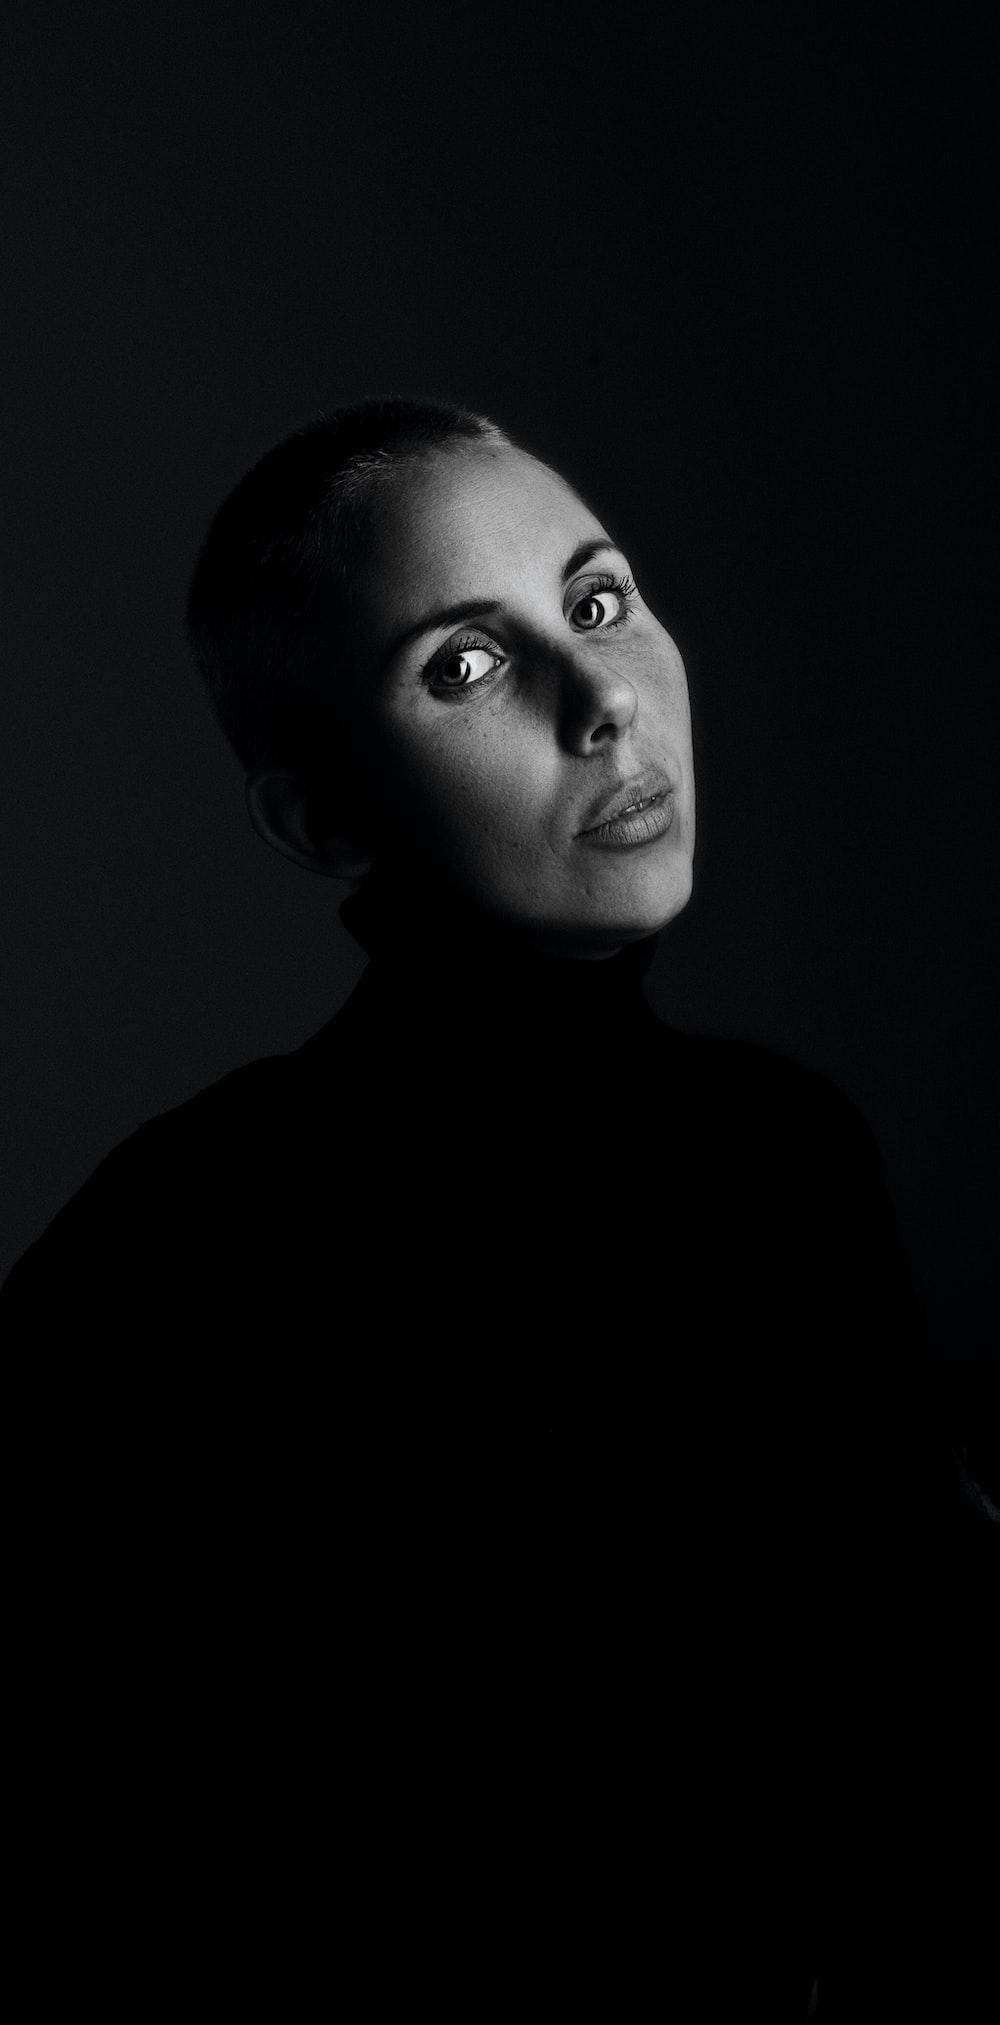 woman wearing black tops